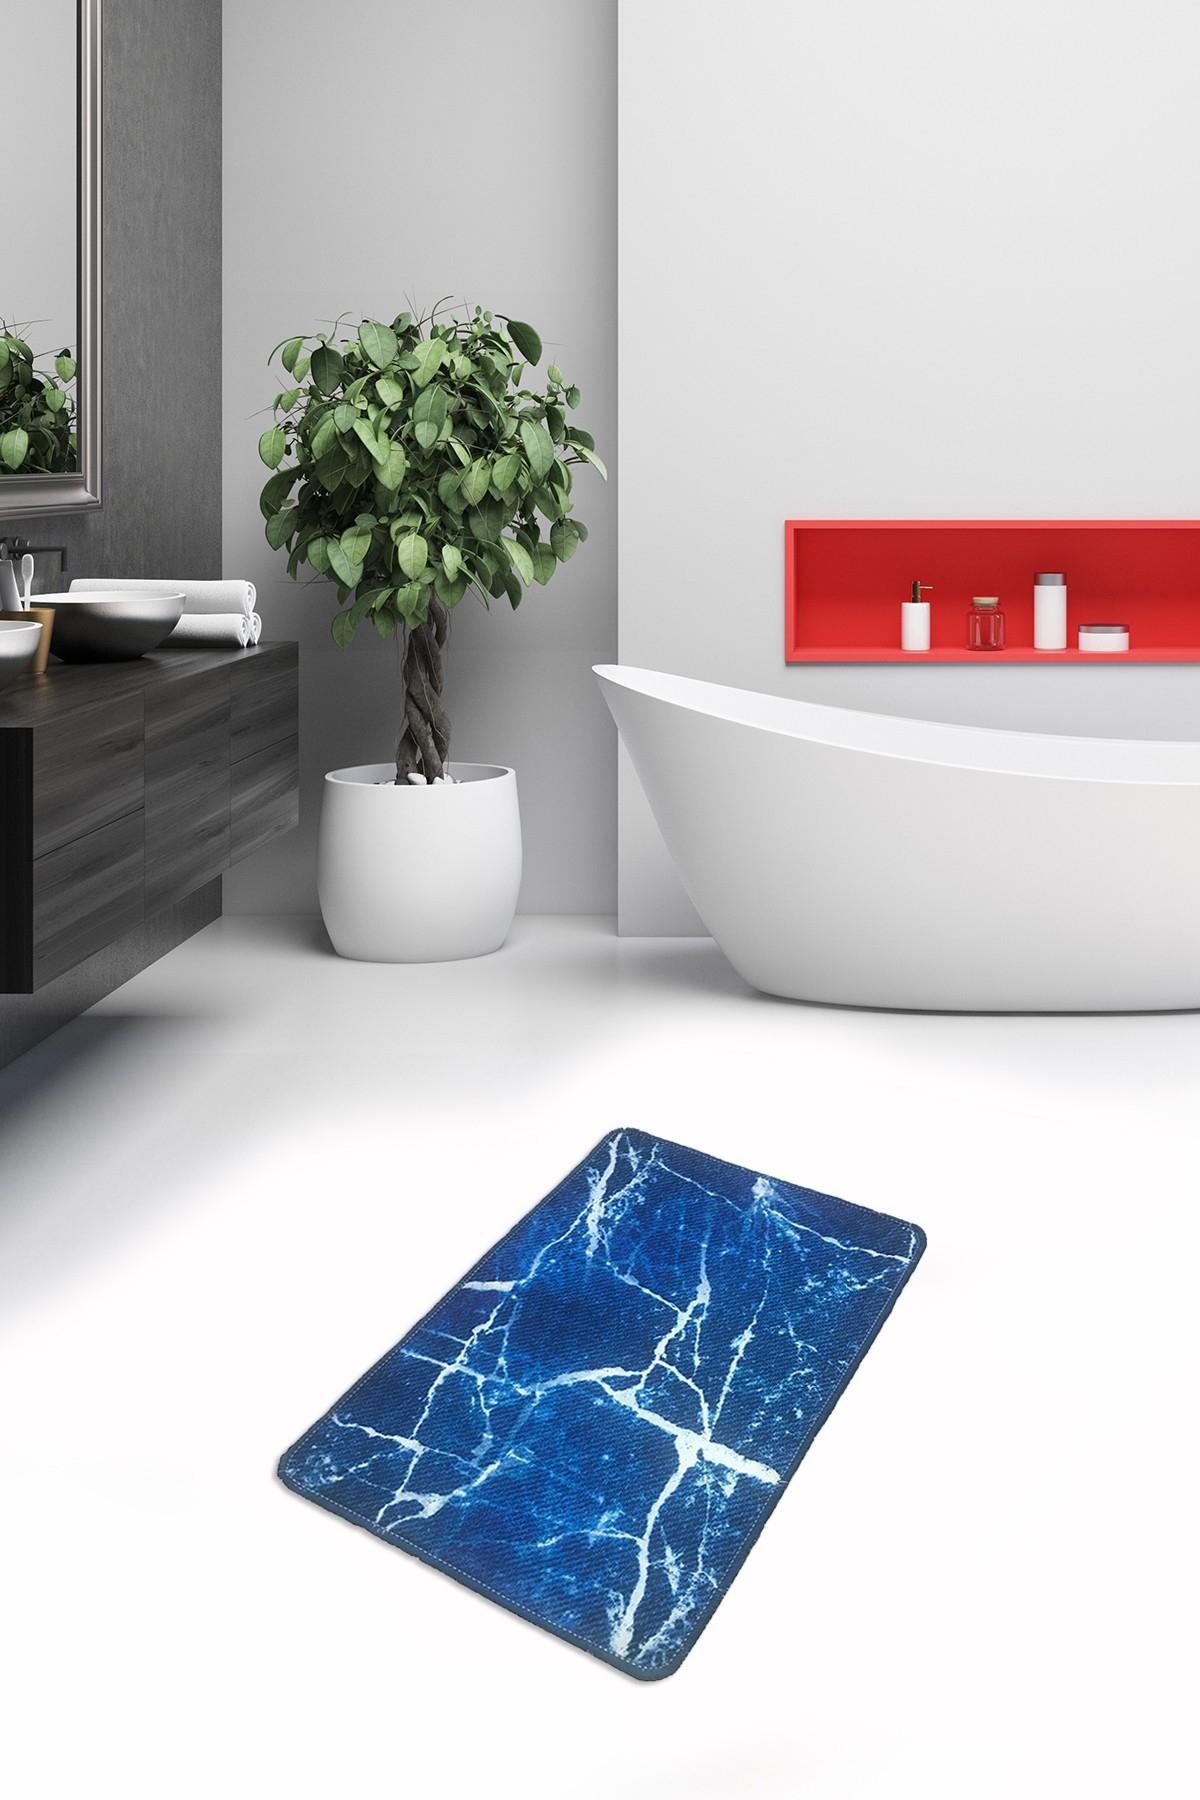 Covoras pentru baie Denim Albastru, 40 x 60 cm poza